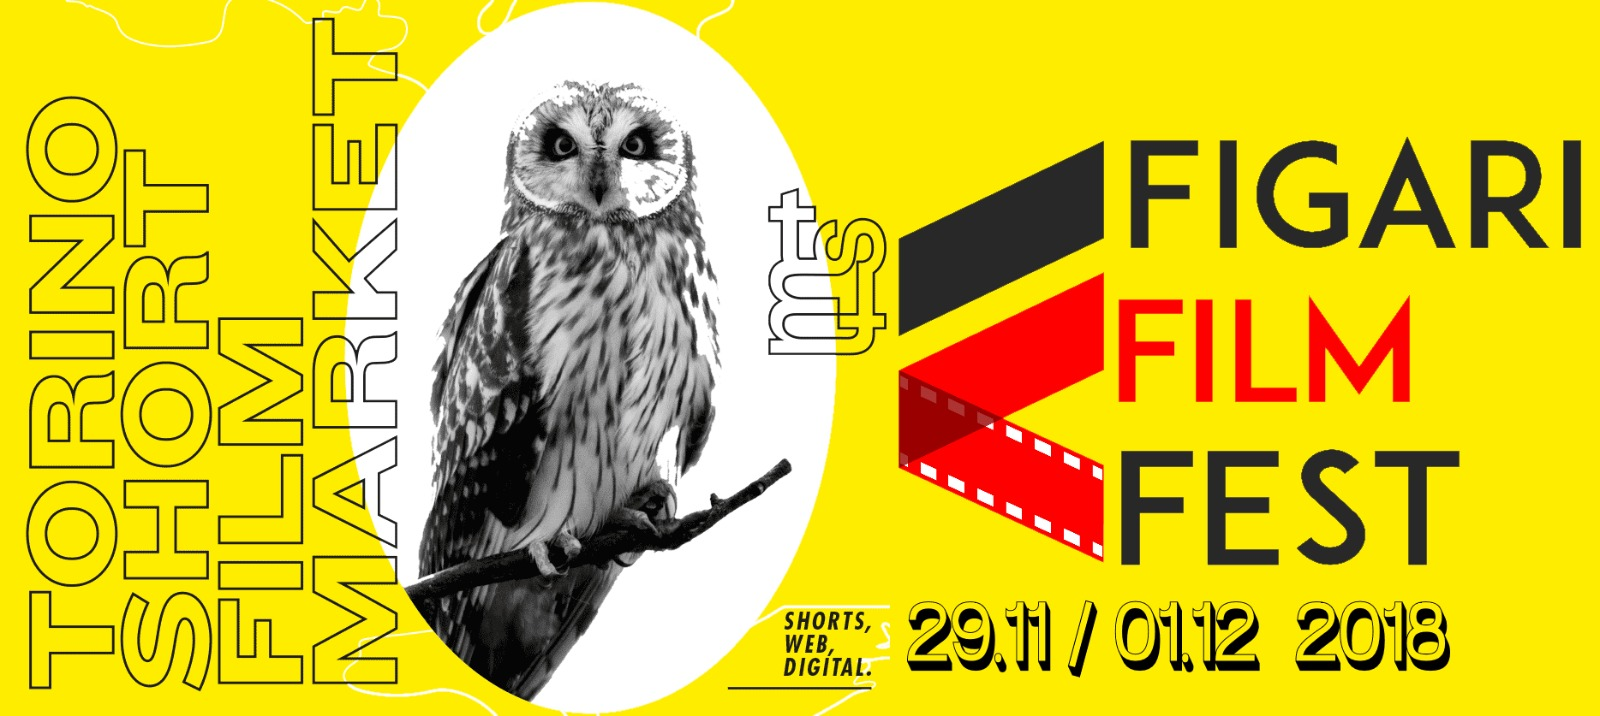 news-torino-film-festival.jpeg